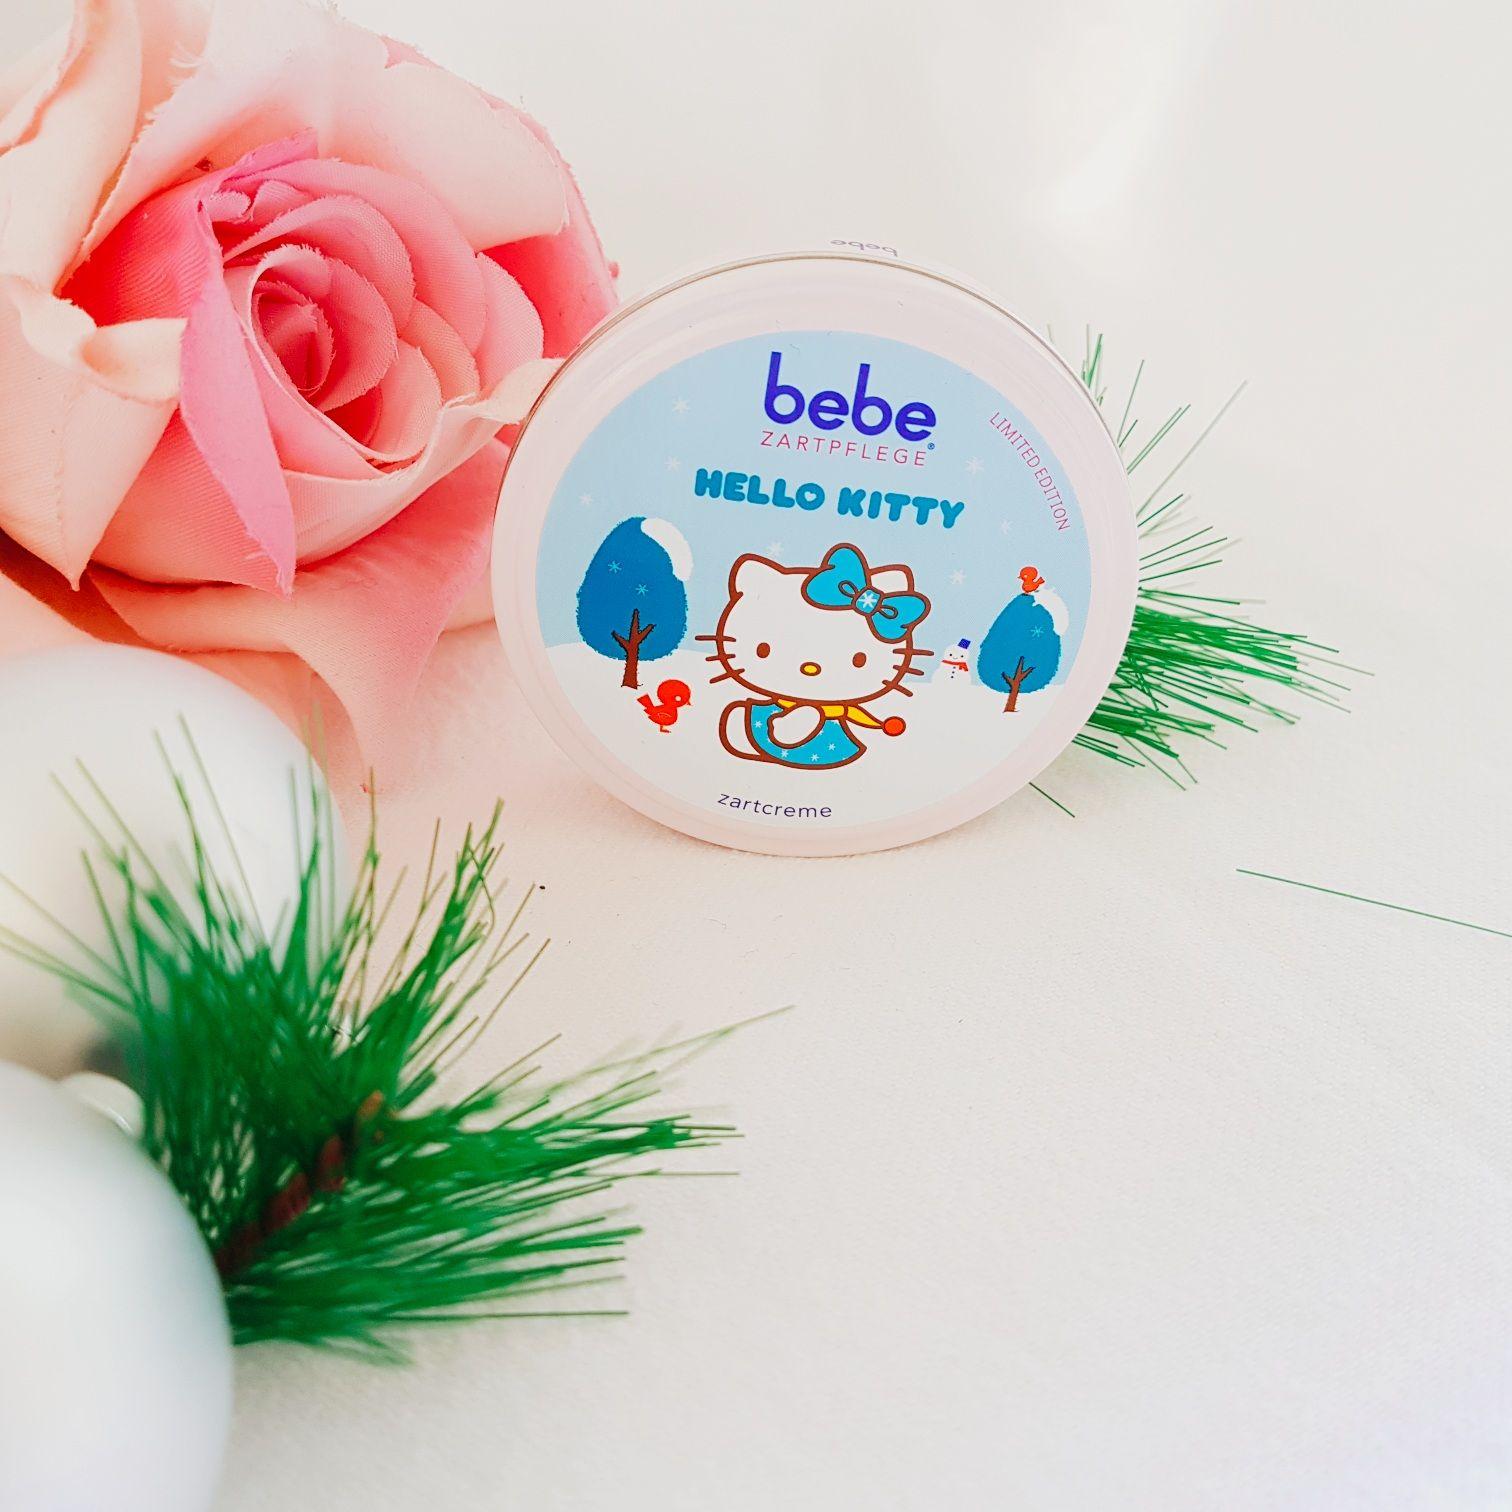 Bebe Zartpflege Hello Kitty